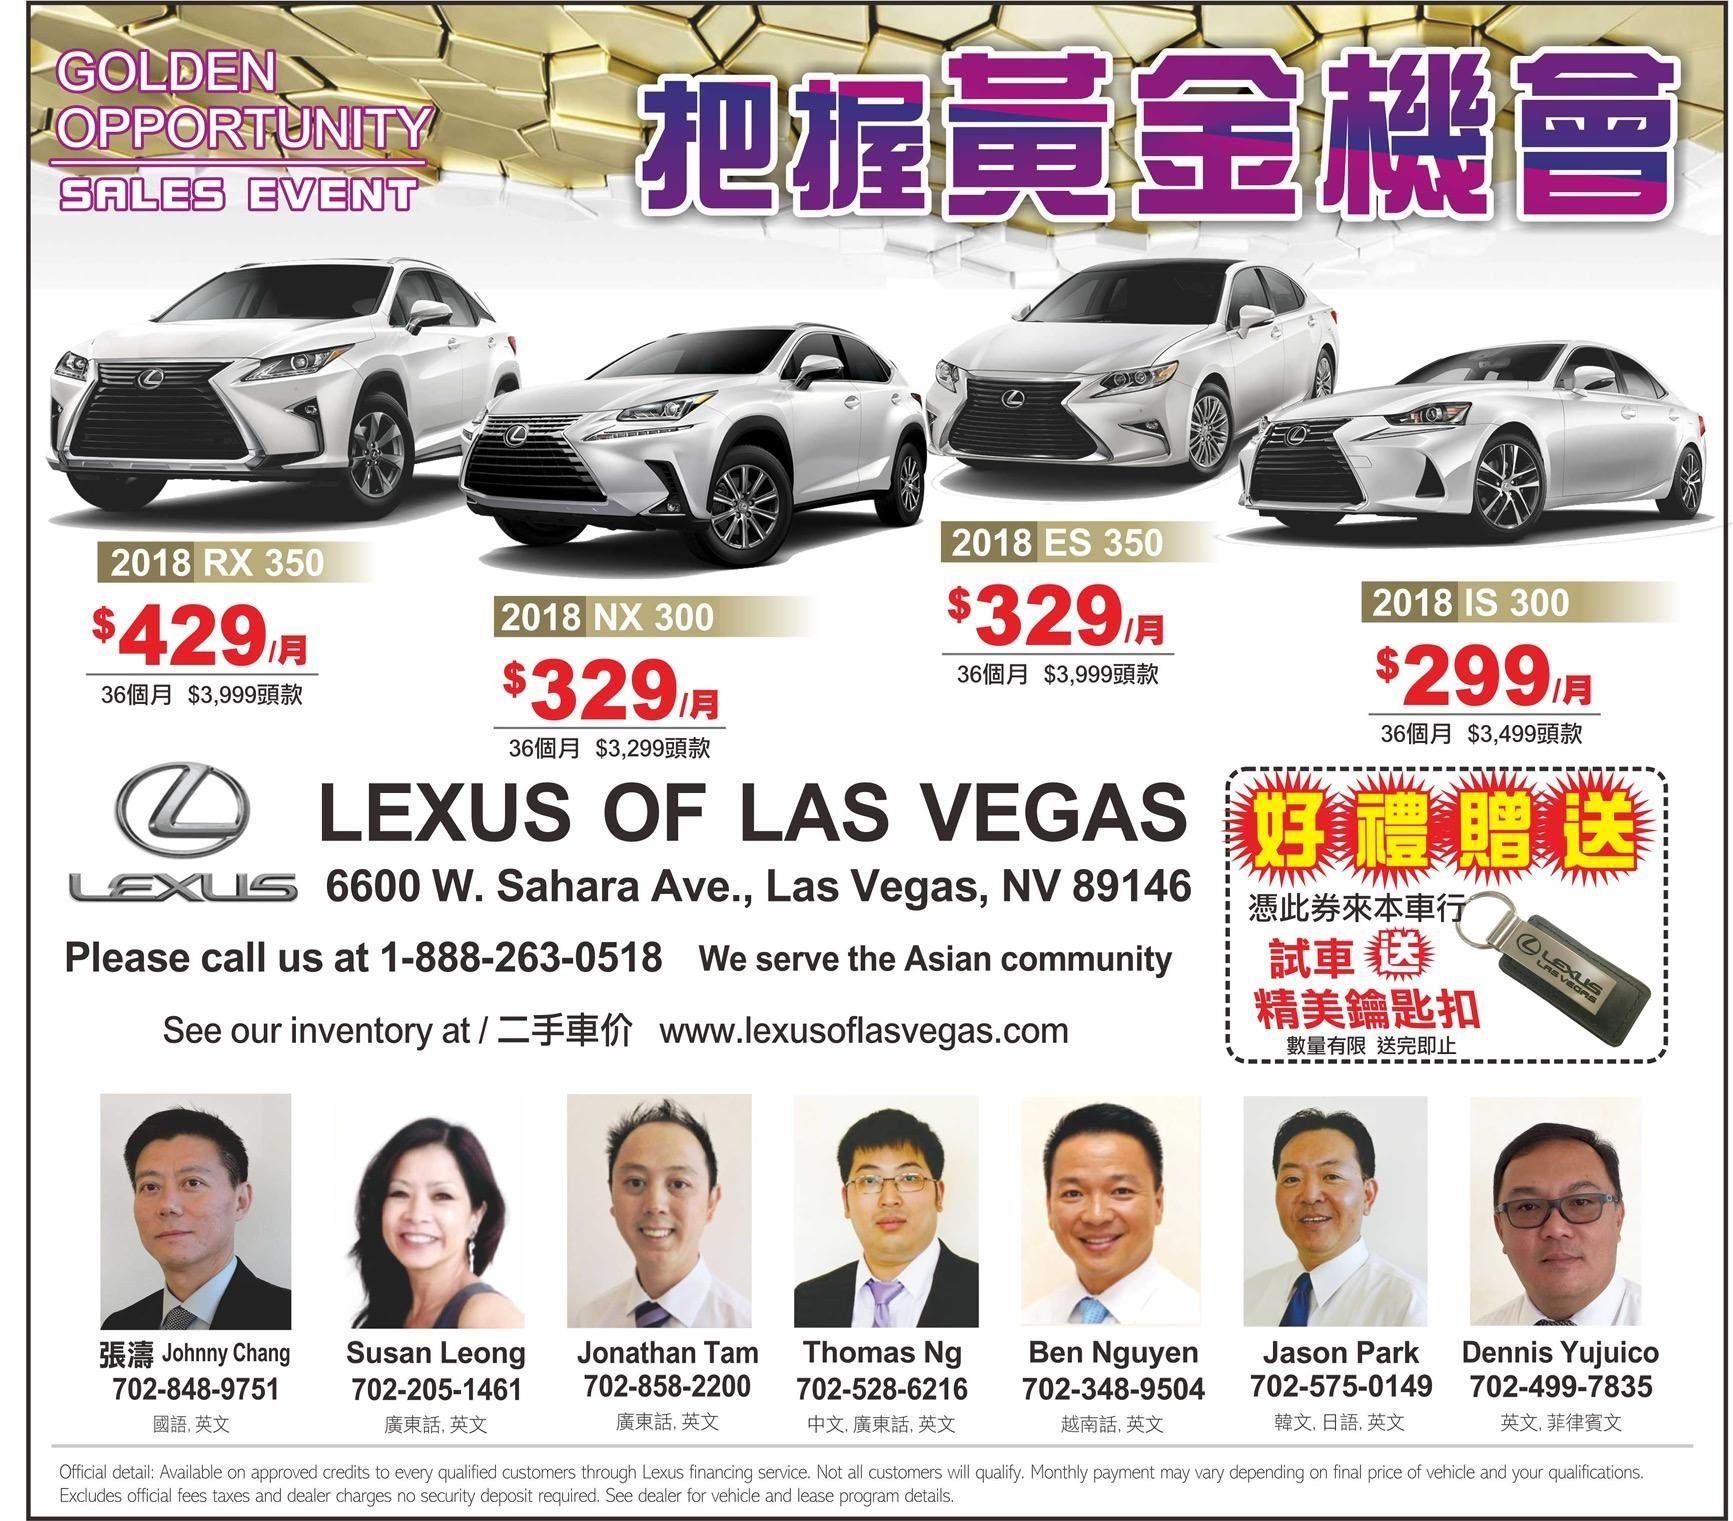 Lexus Of Las Vegas Is Proud To Serve The Asian Community Las Vegas Lexus Vegas